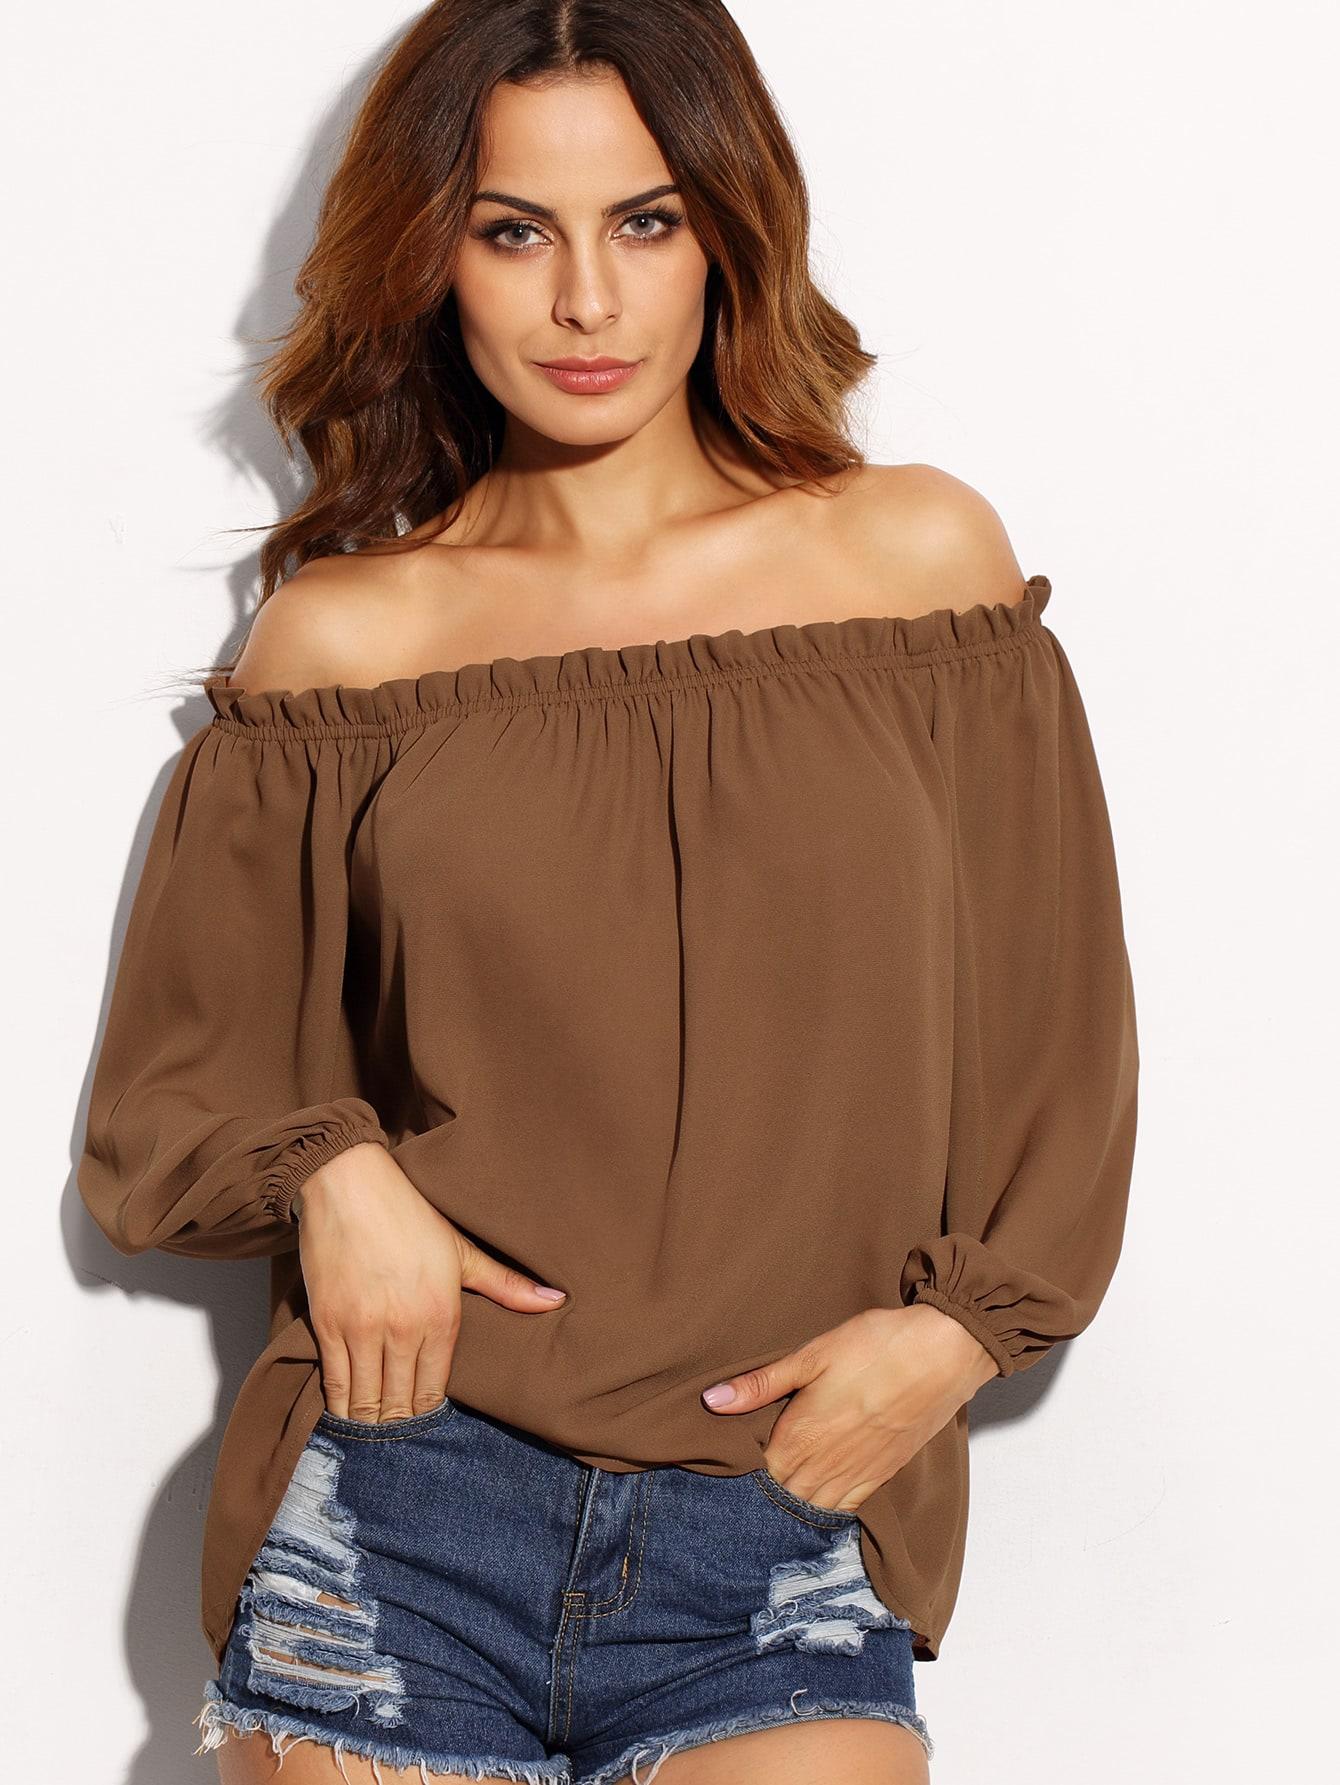 blouse160728719_4